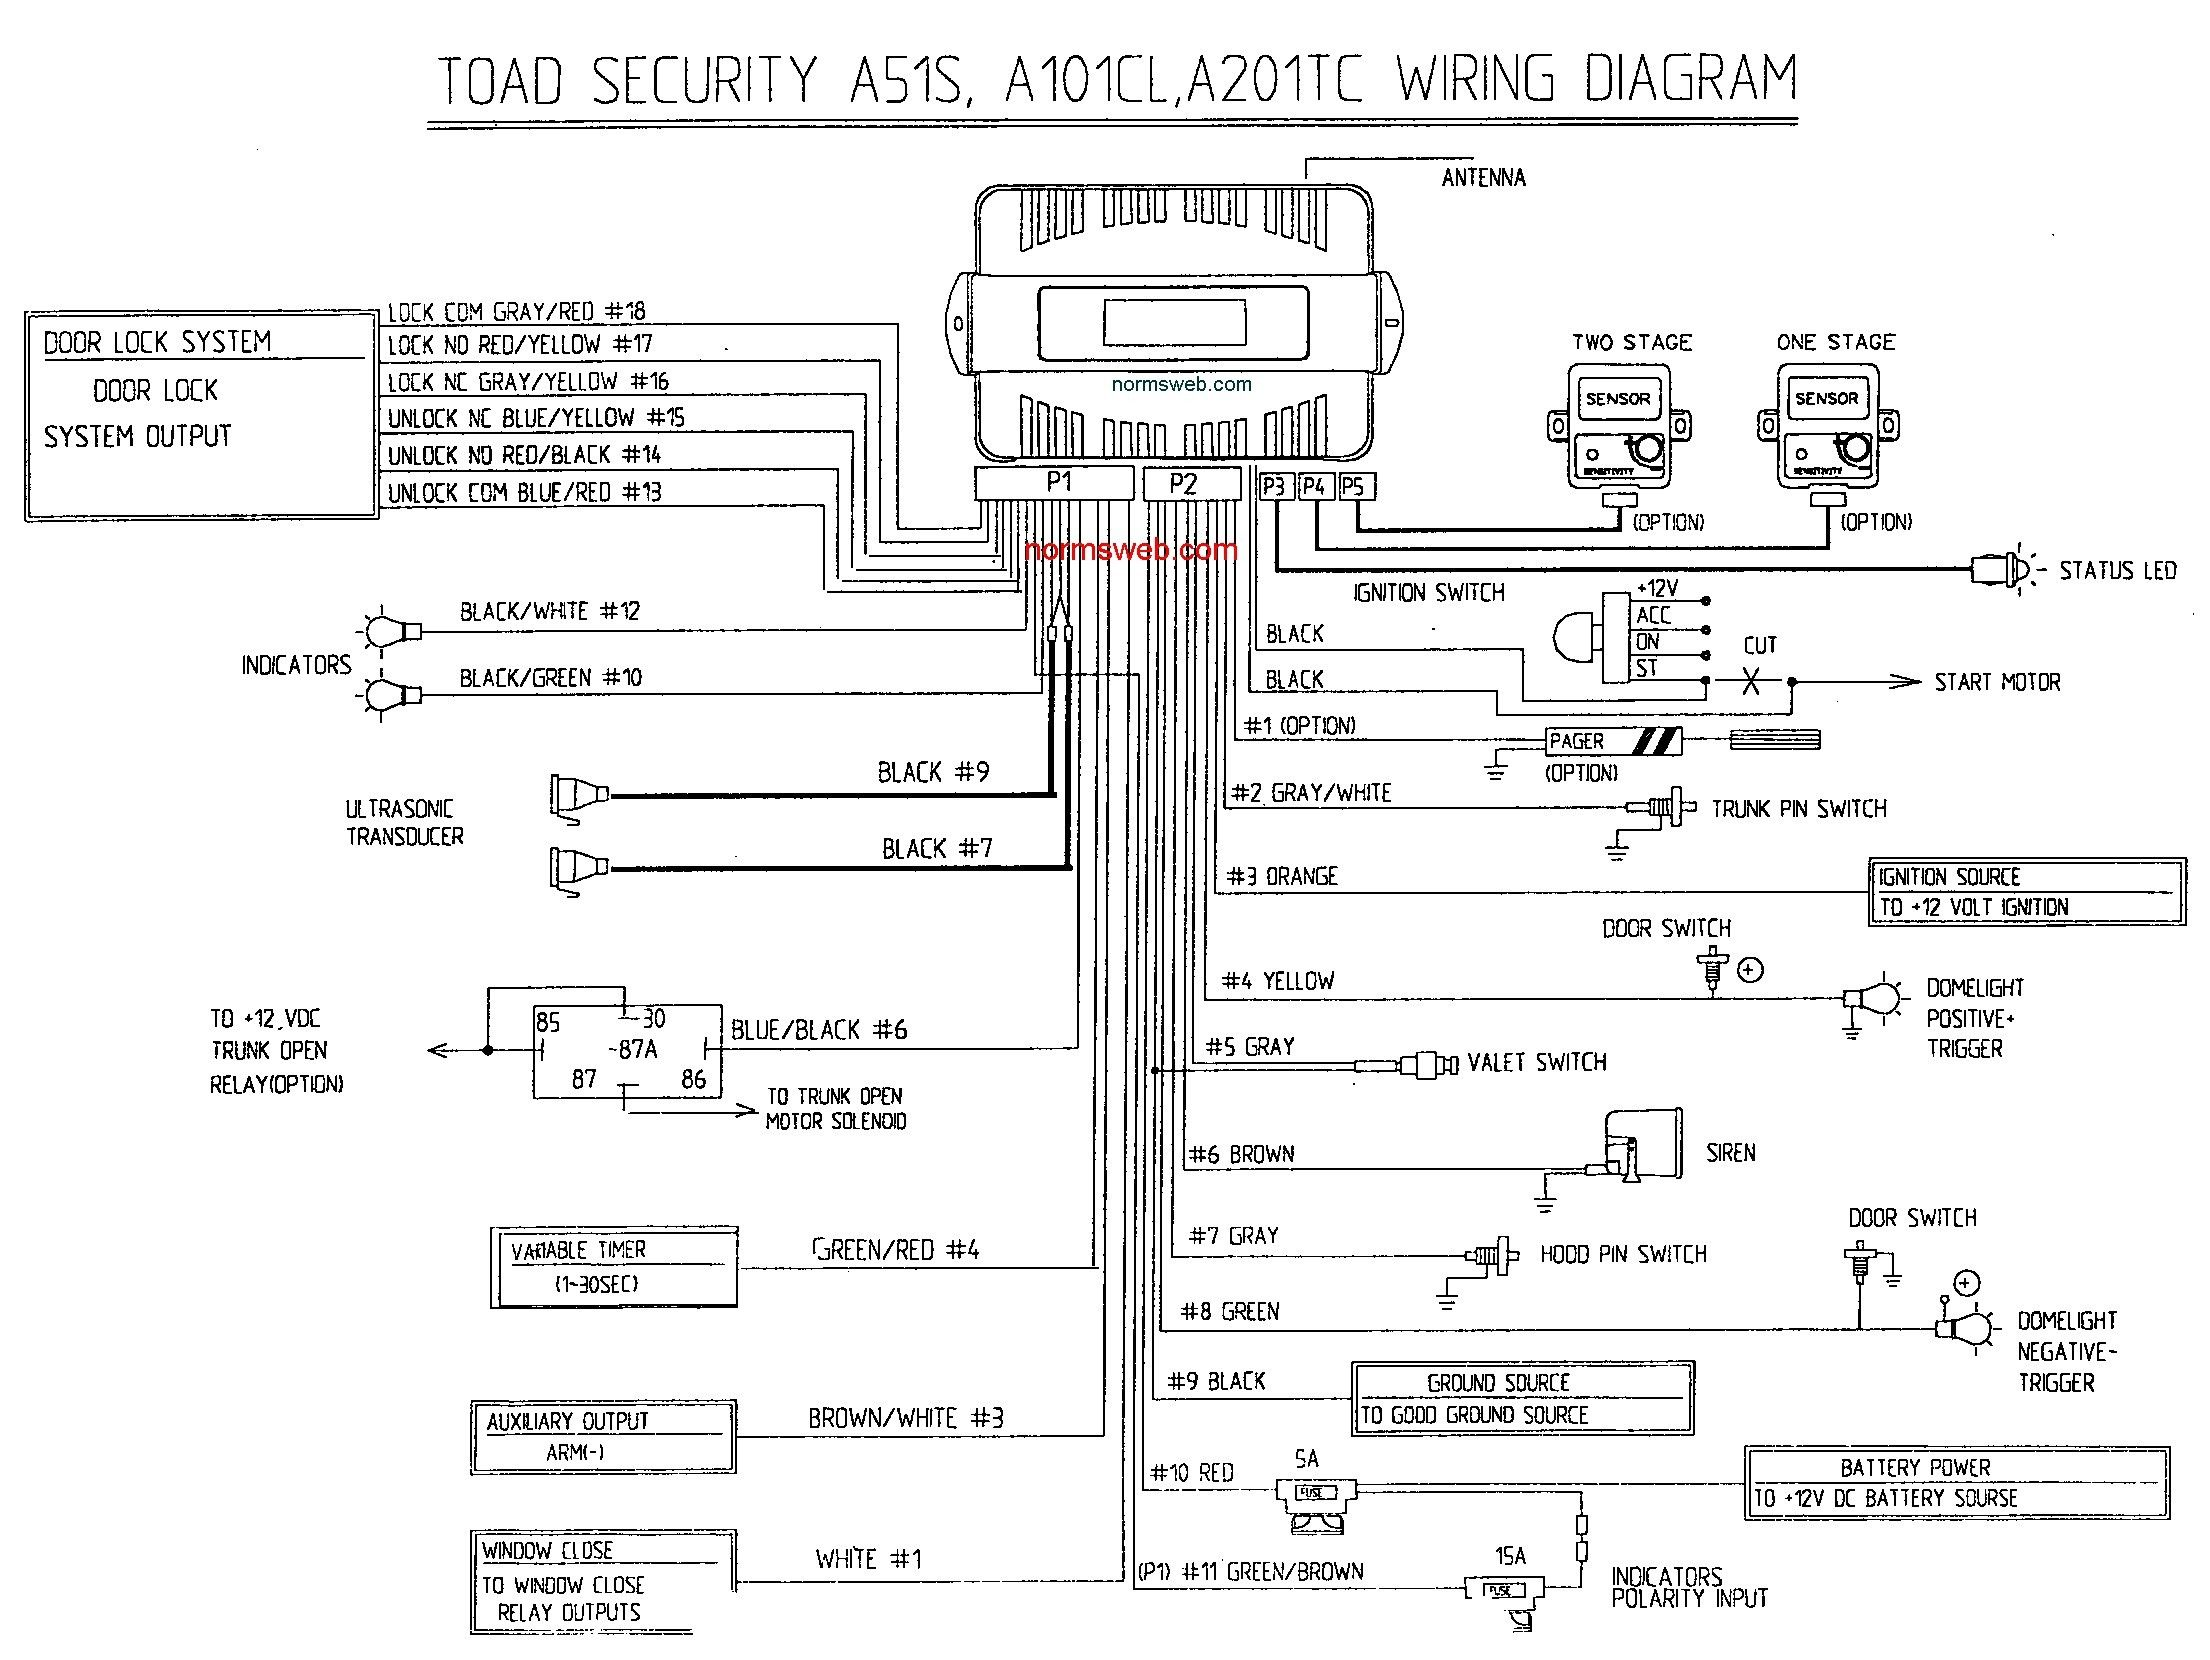 New Wiring Diagram Of Zen Car Senor